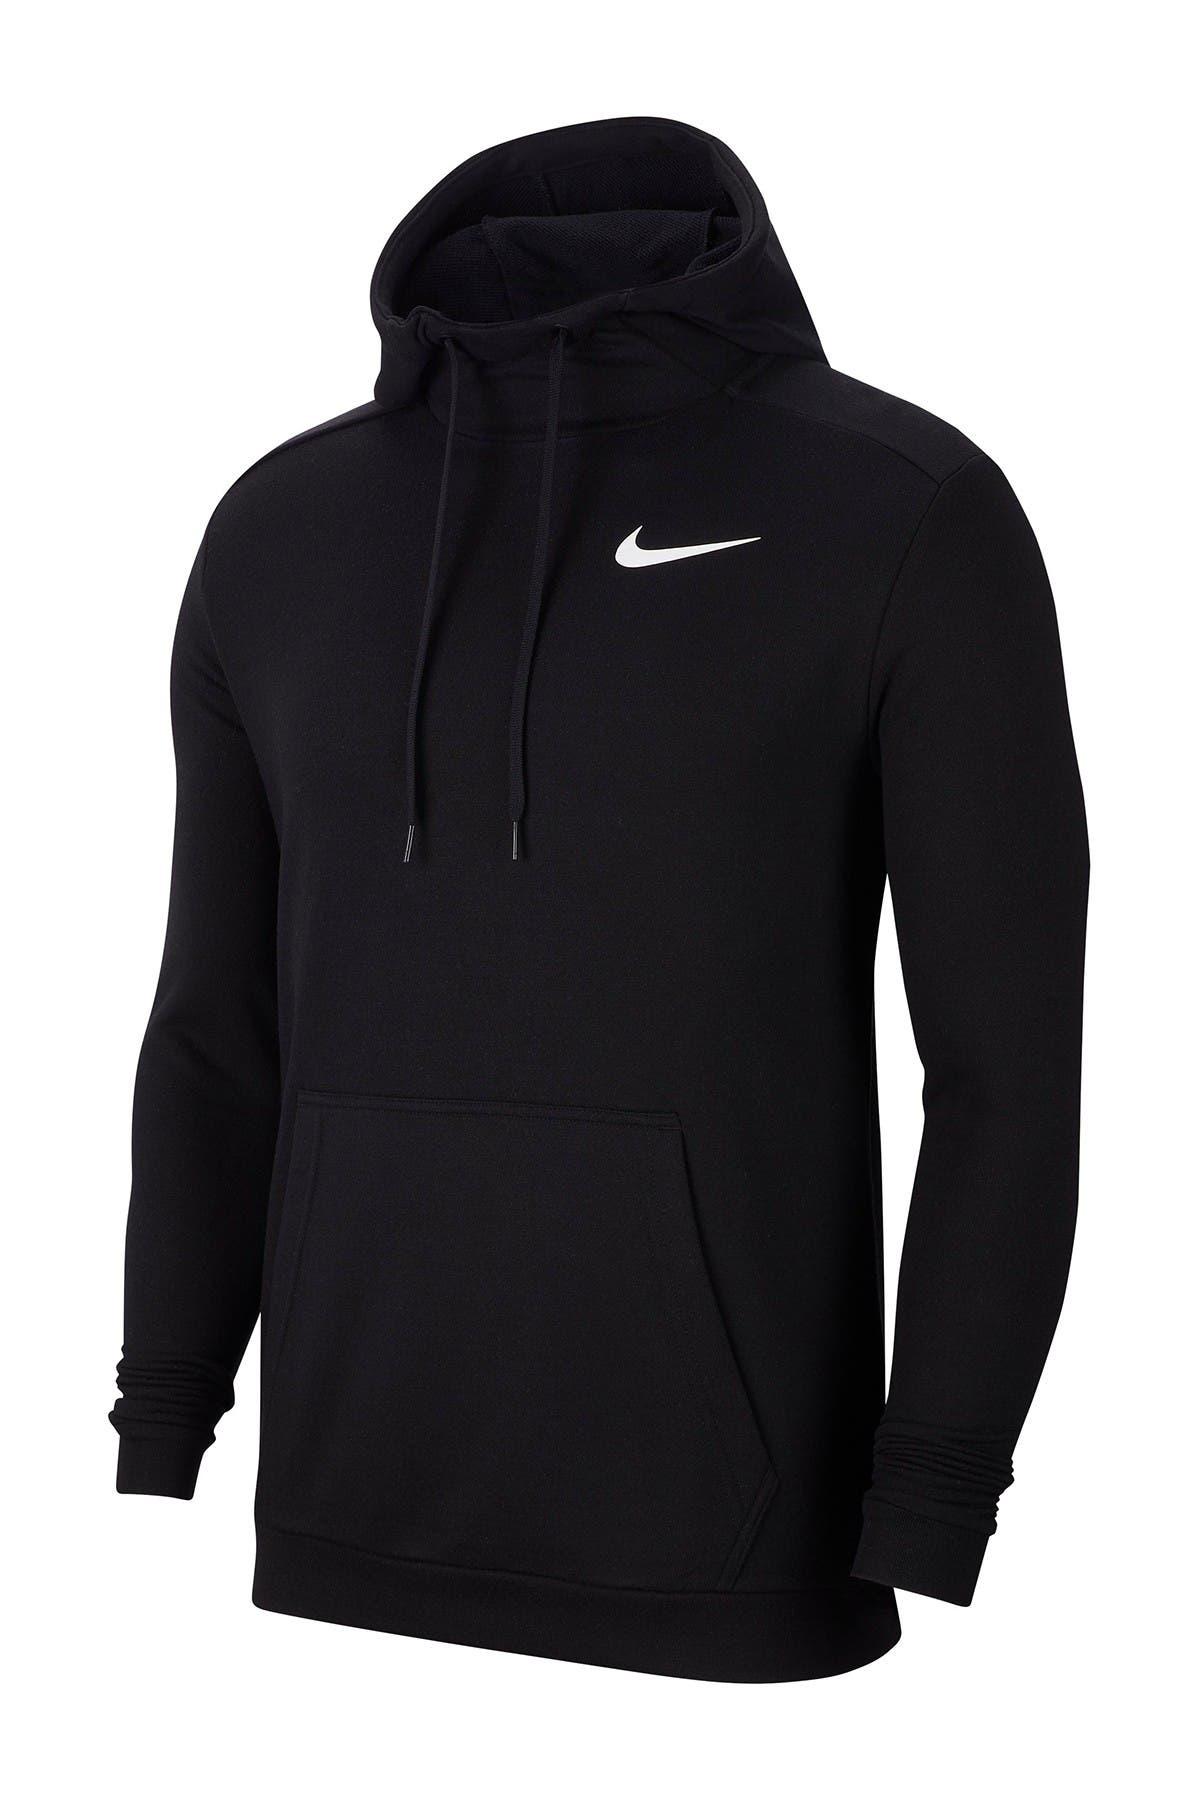 Image of Nike Dri-Fit Pullover Hoodie